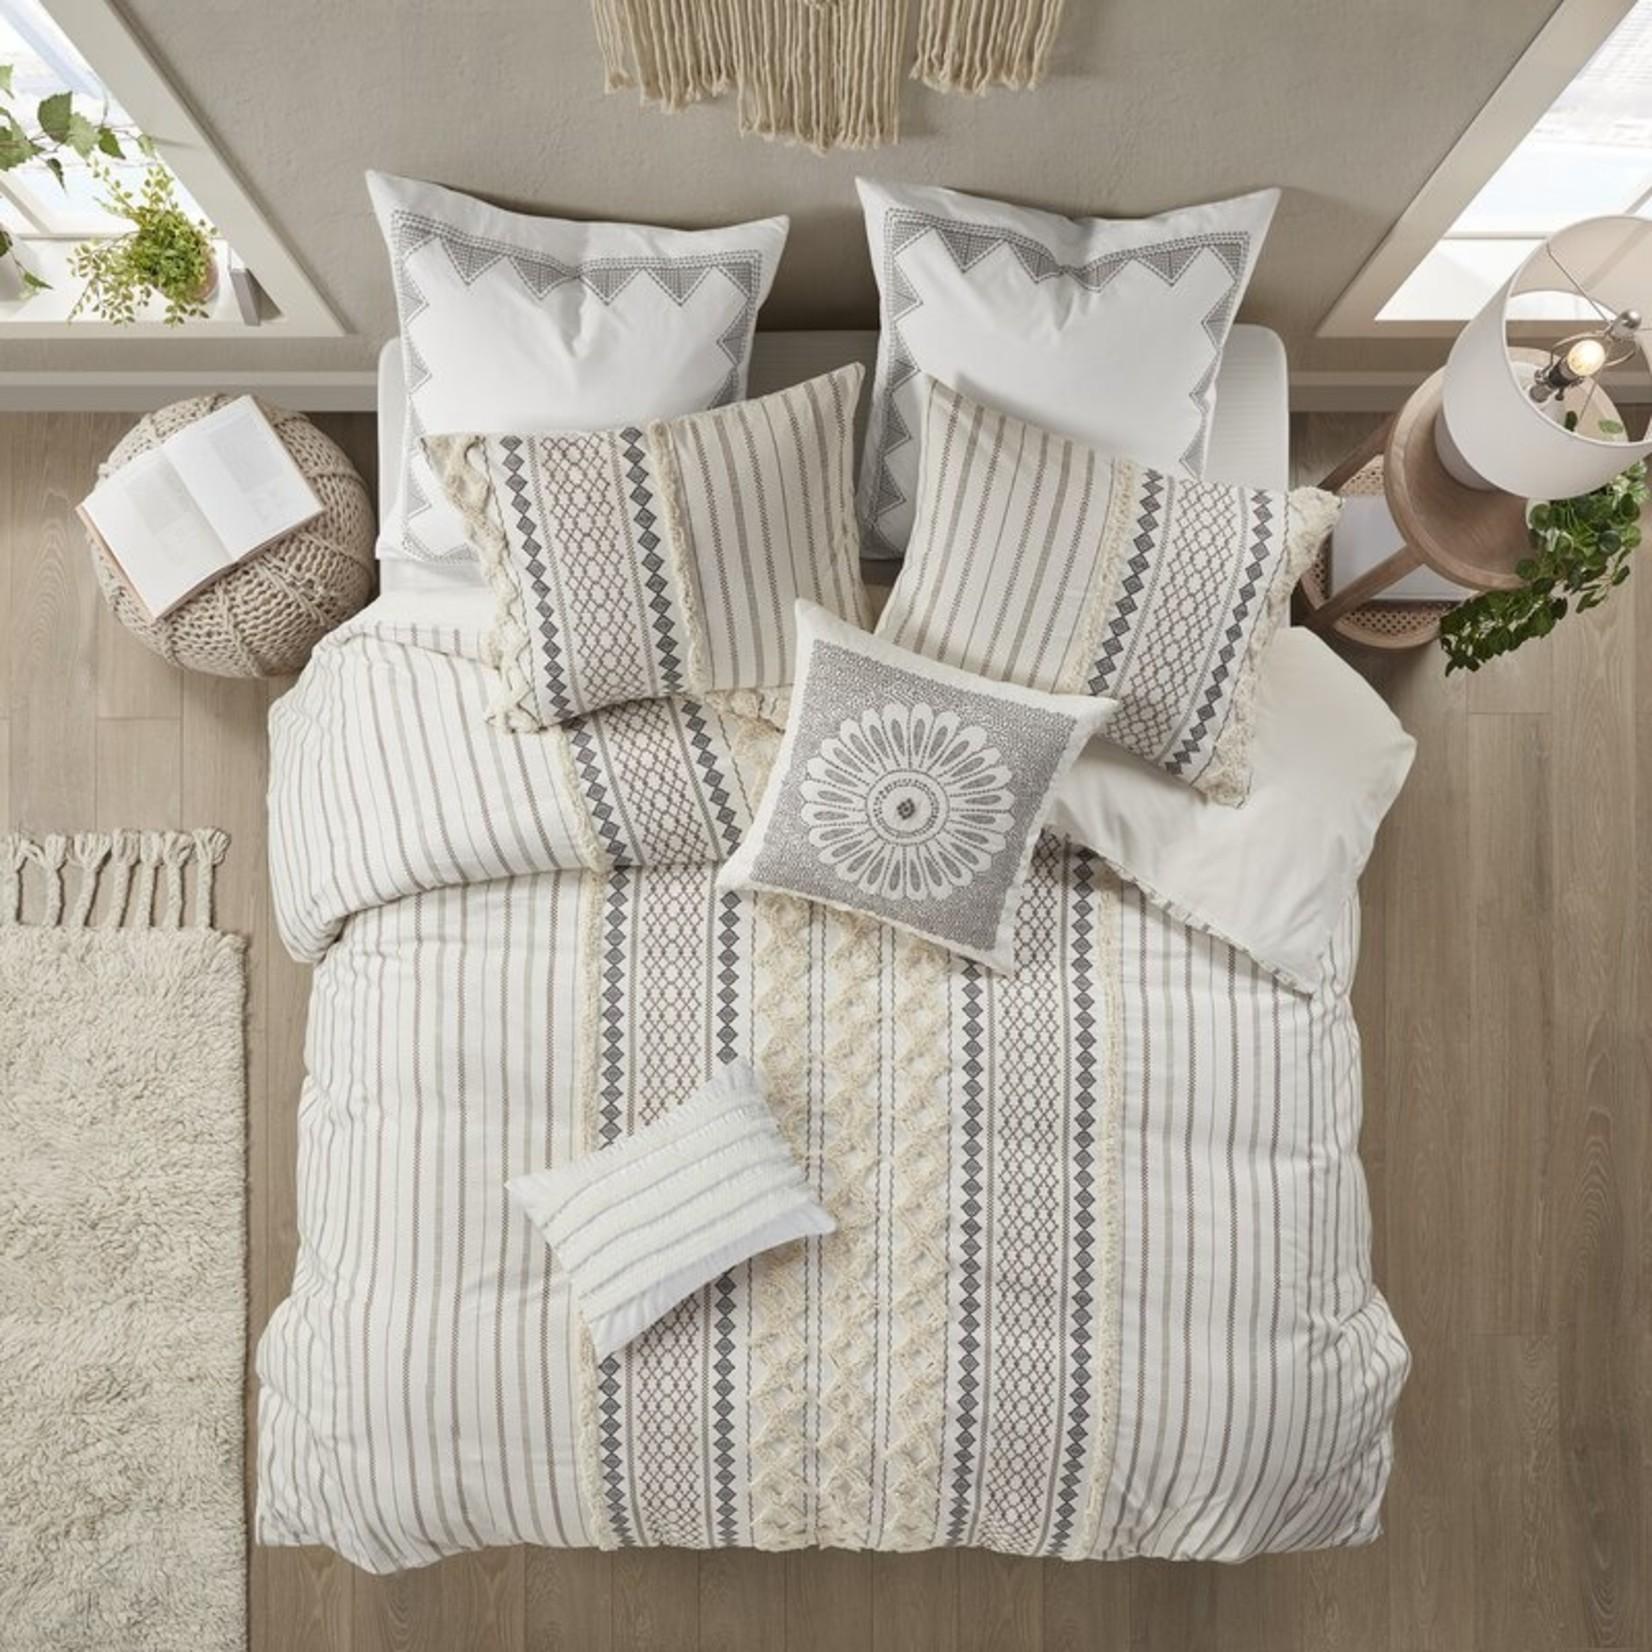 *Jenkinsburg Comforter Set - King/Cal King - FINAL SALE